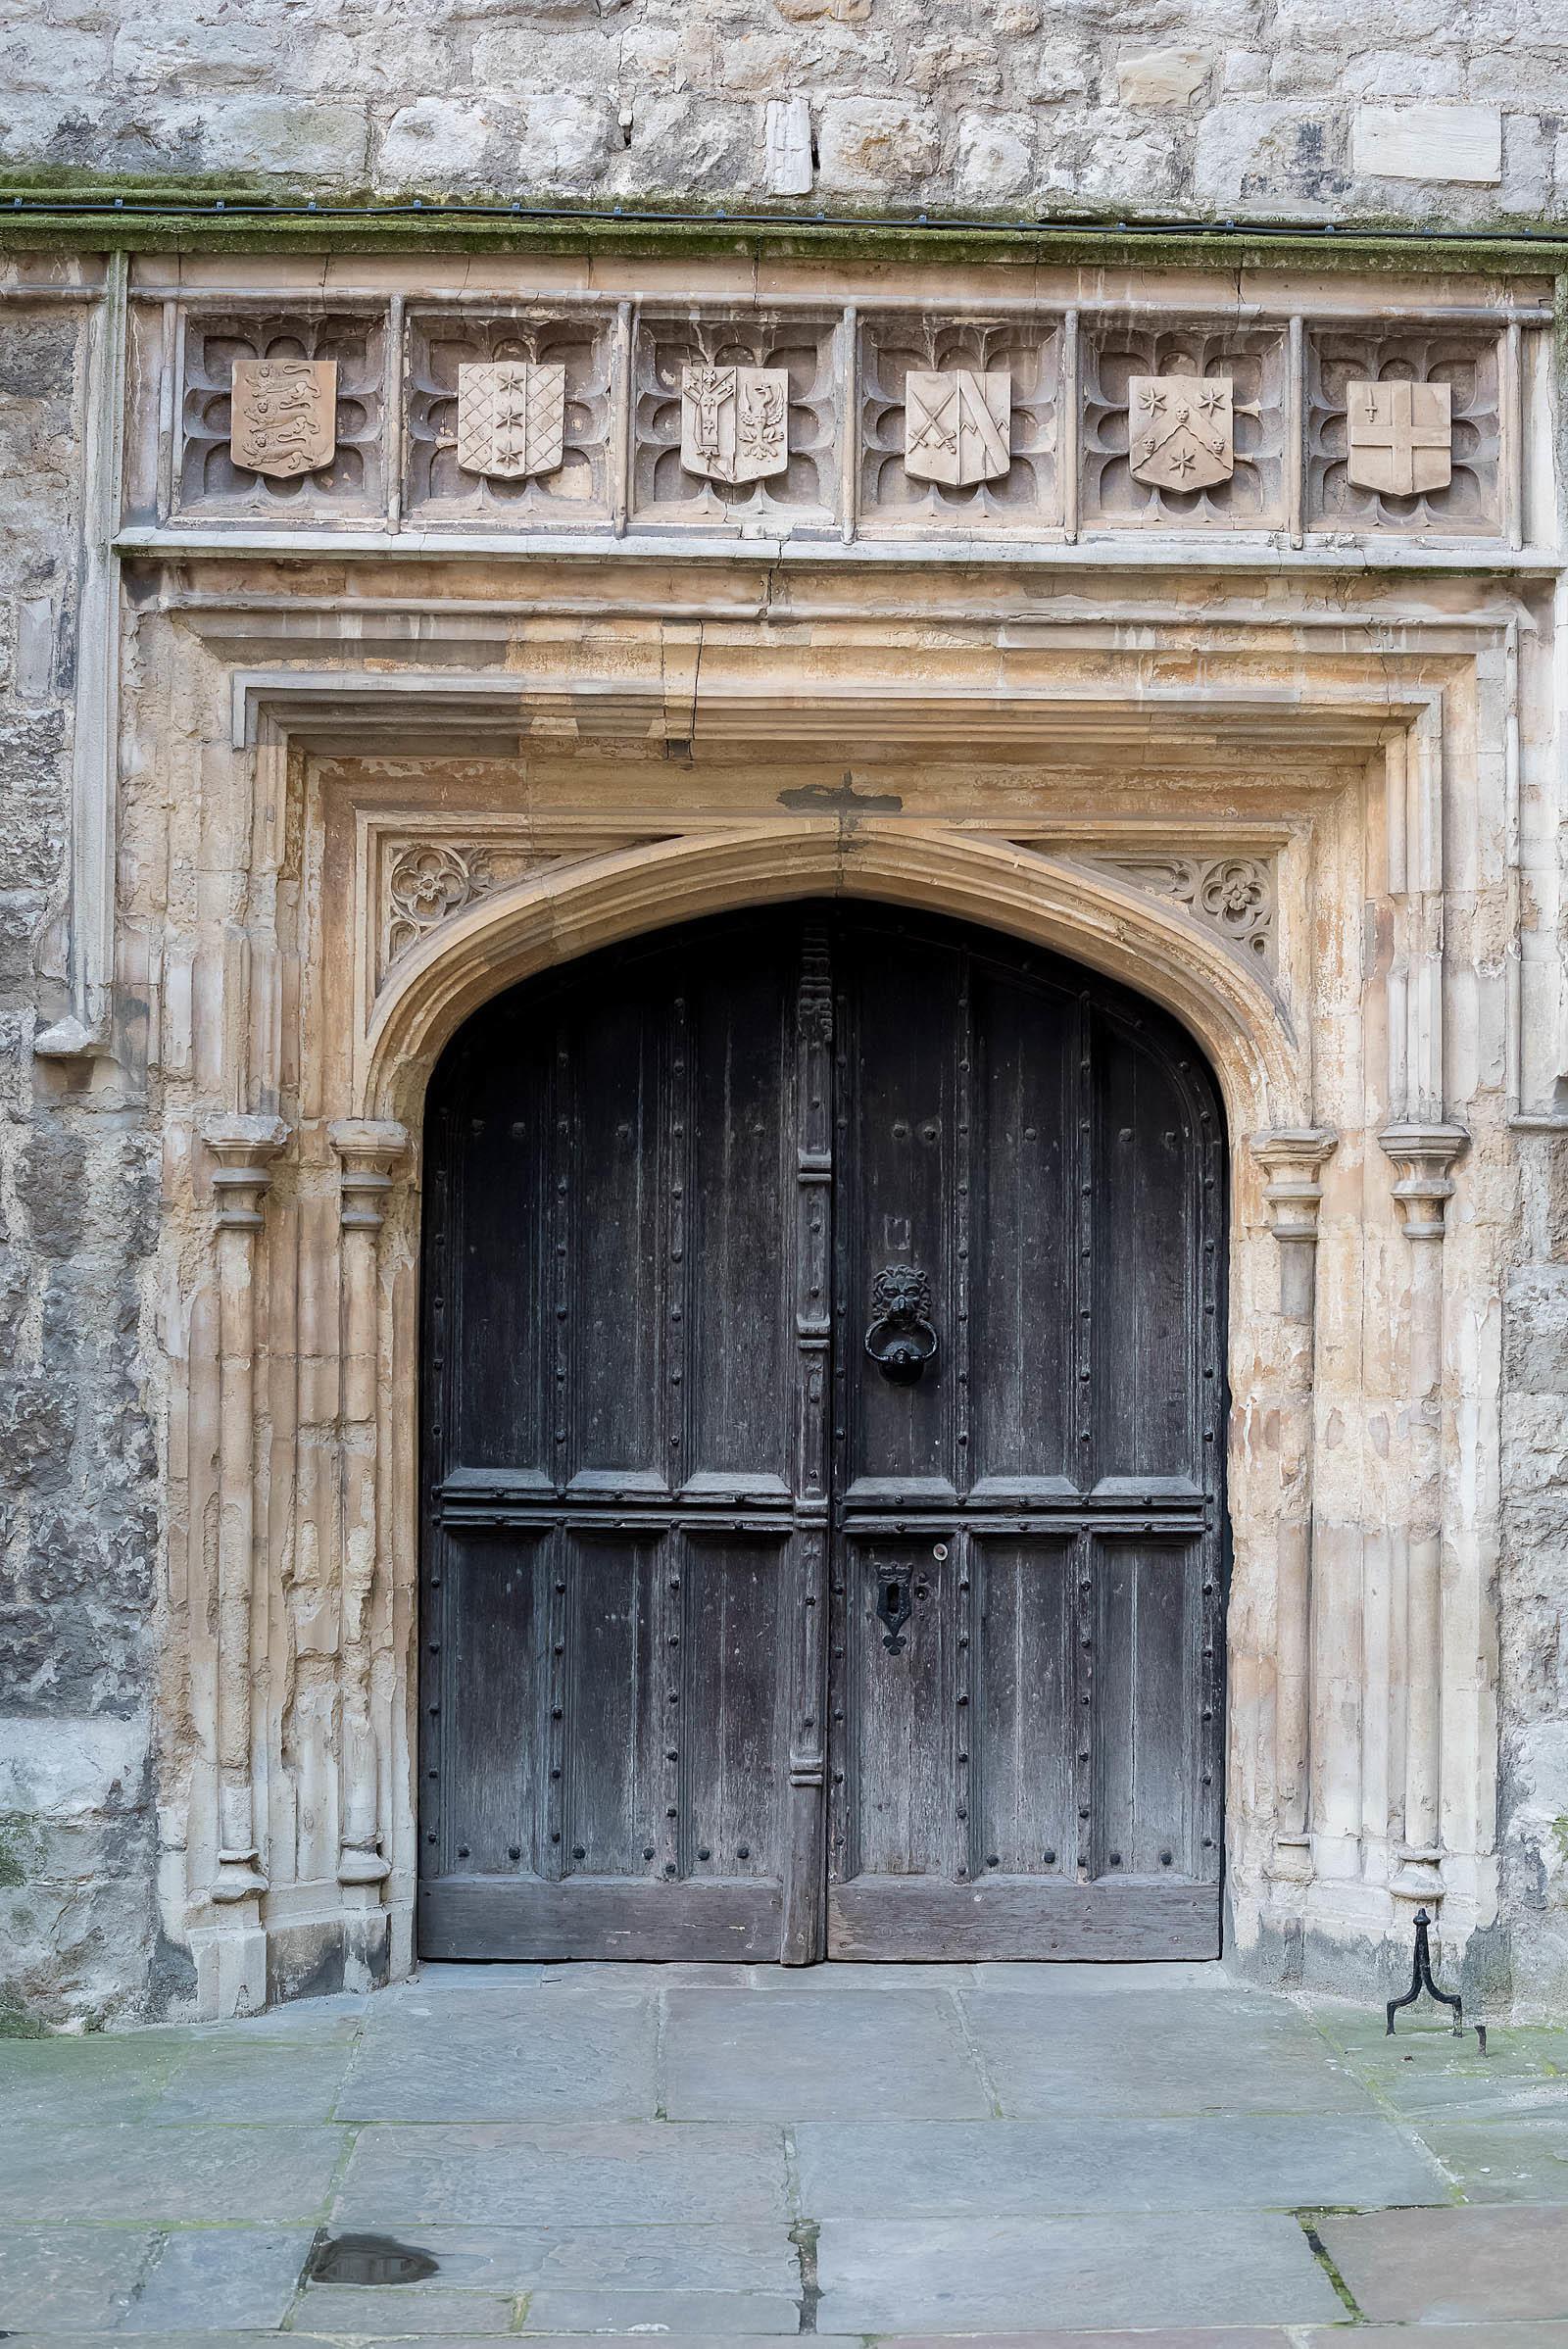 London Church Architecture